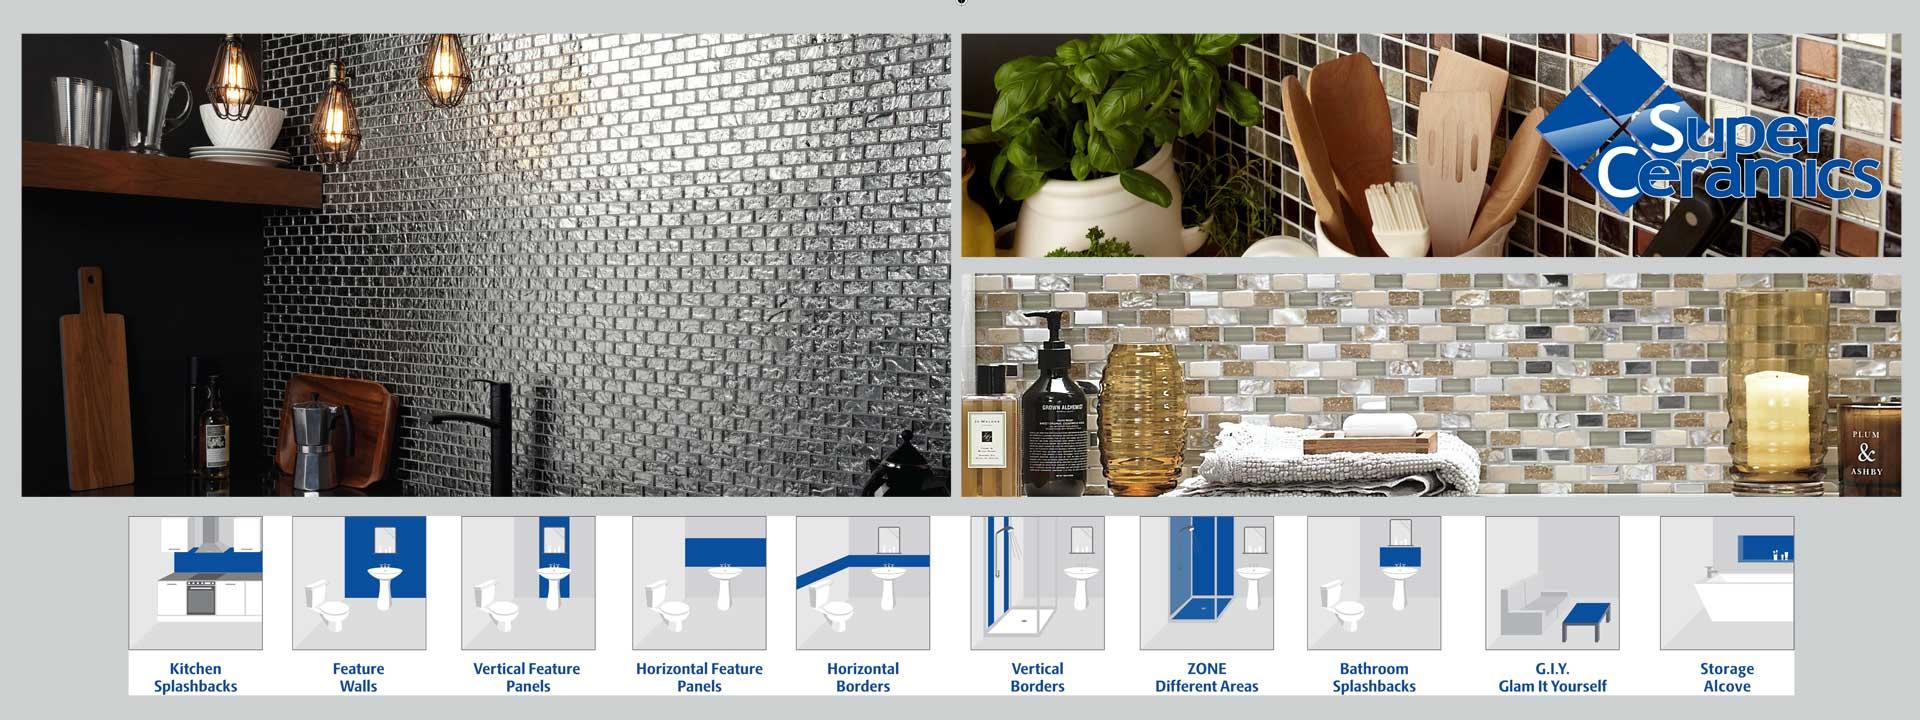 Superceramics Sales Superceramic Tile Shop - Discount tile warehouse near me